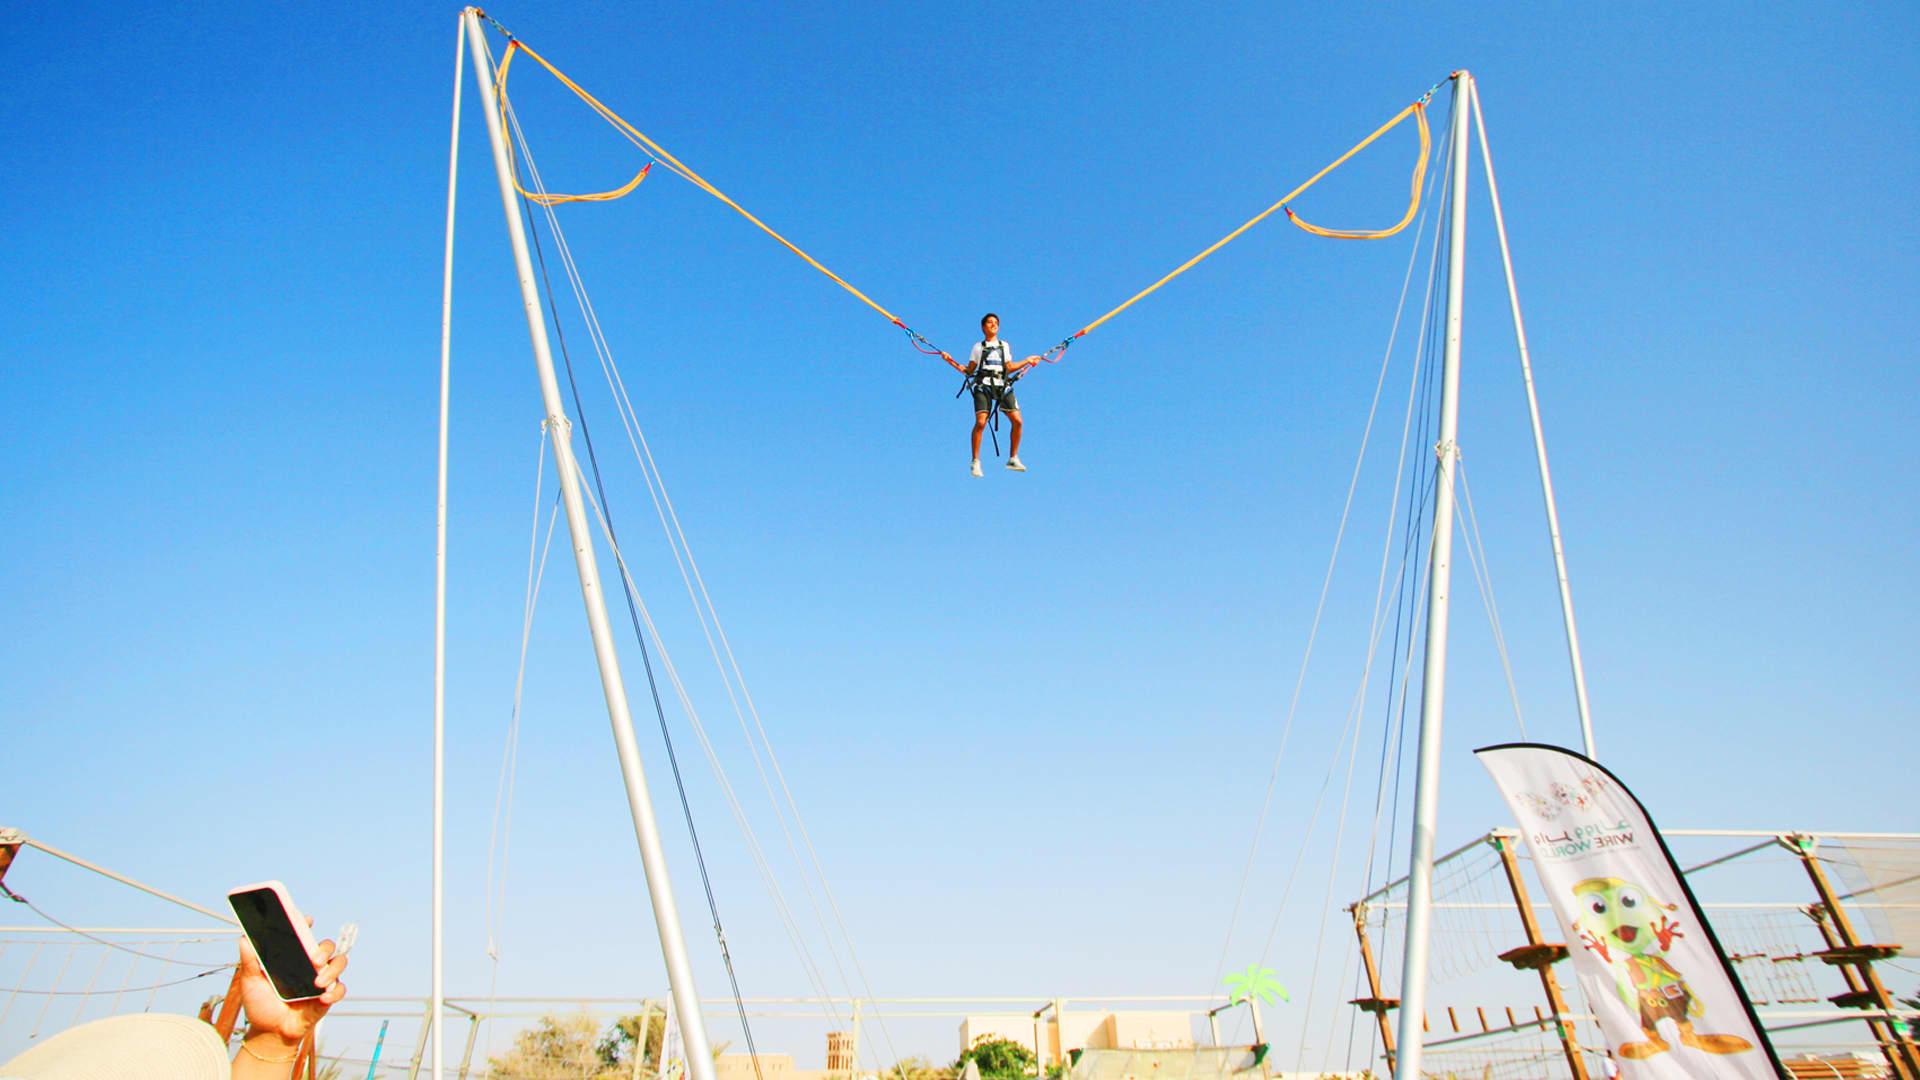 Swinging Tarzan + Bungee Ejection Kite beach